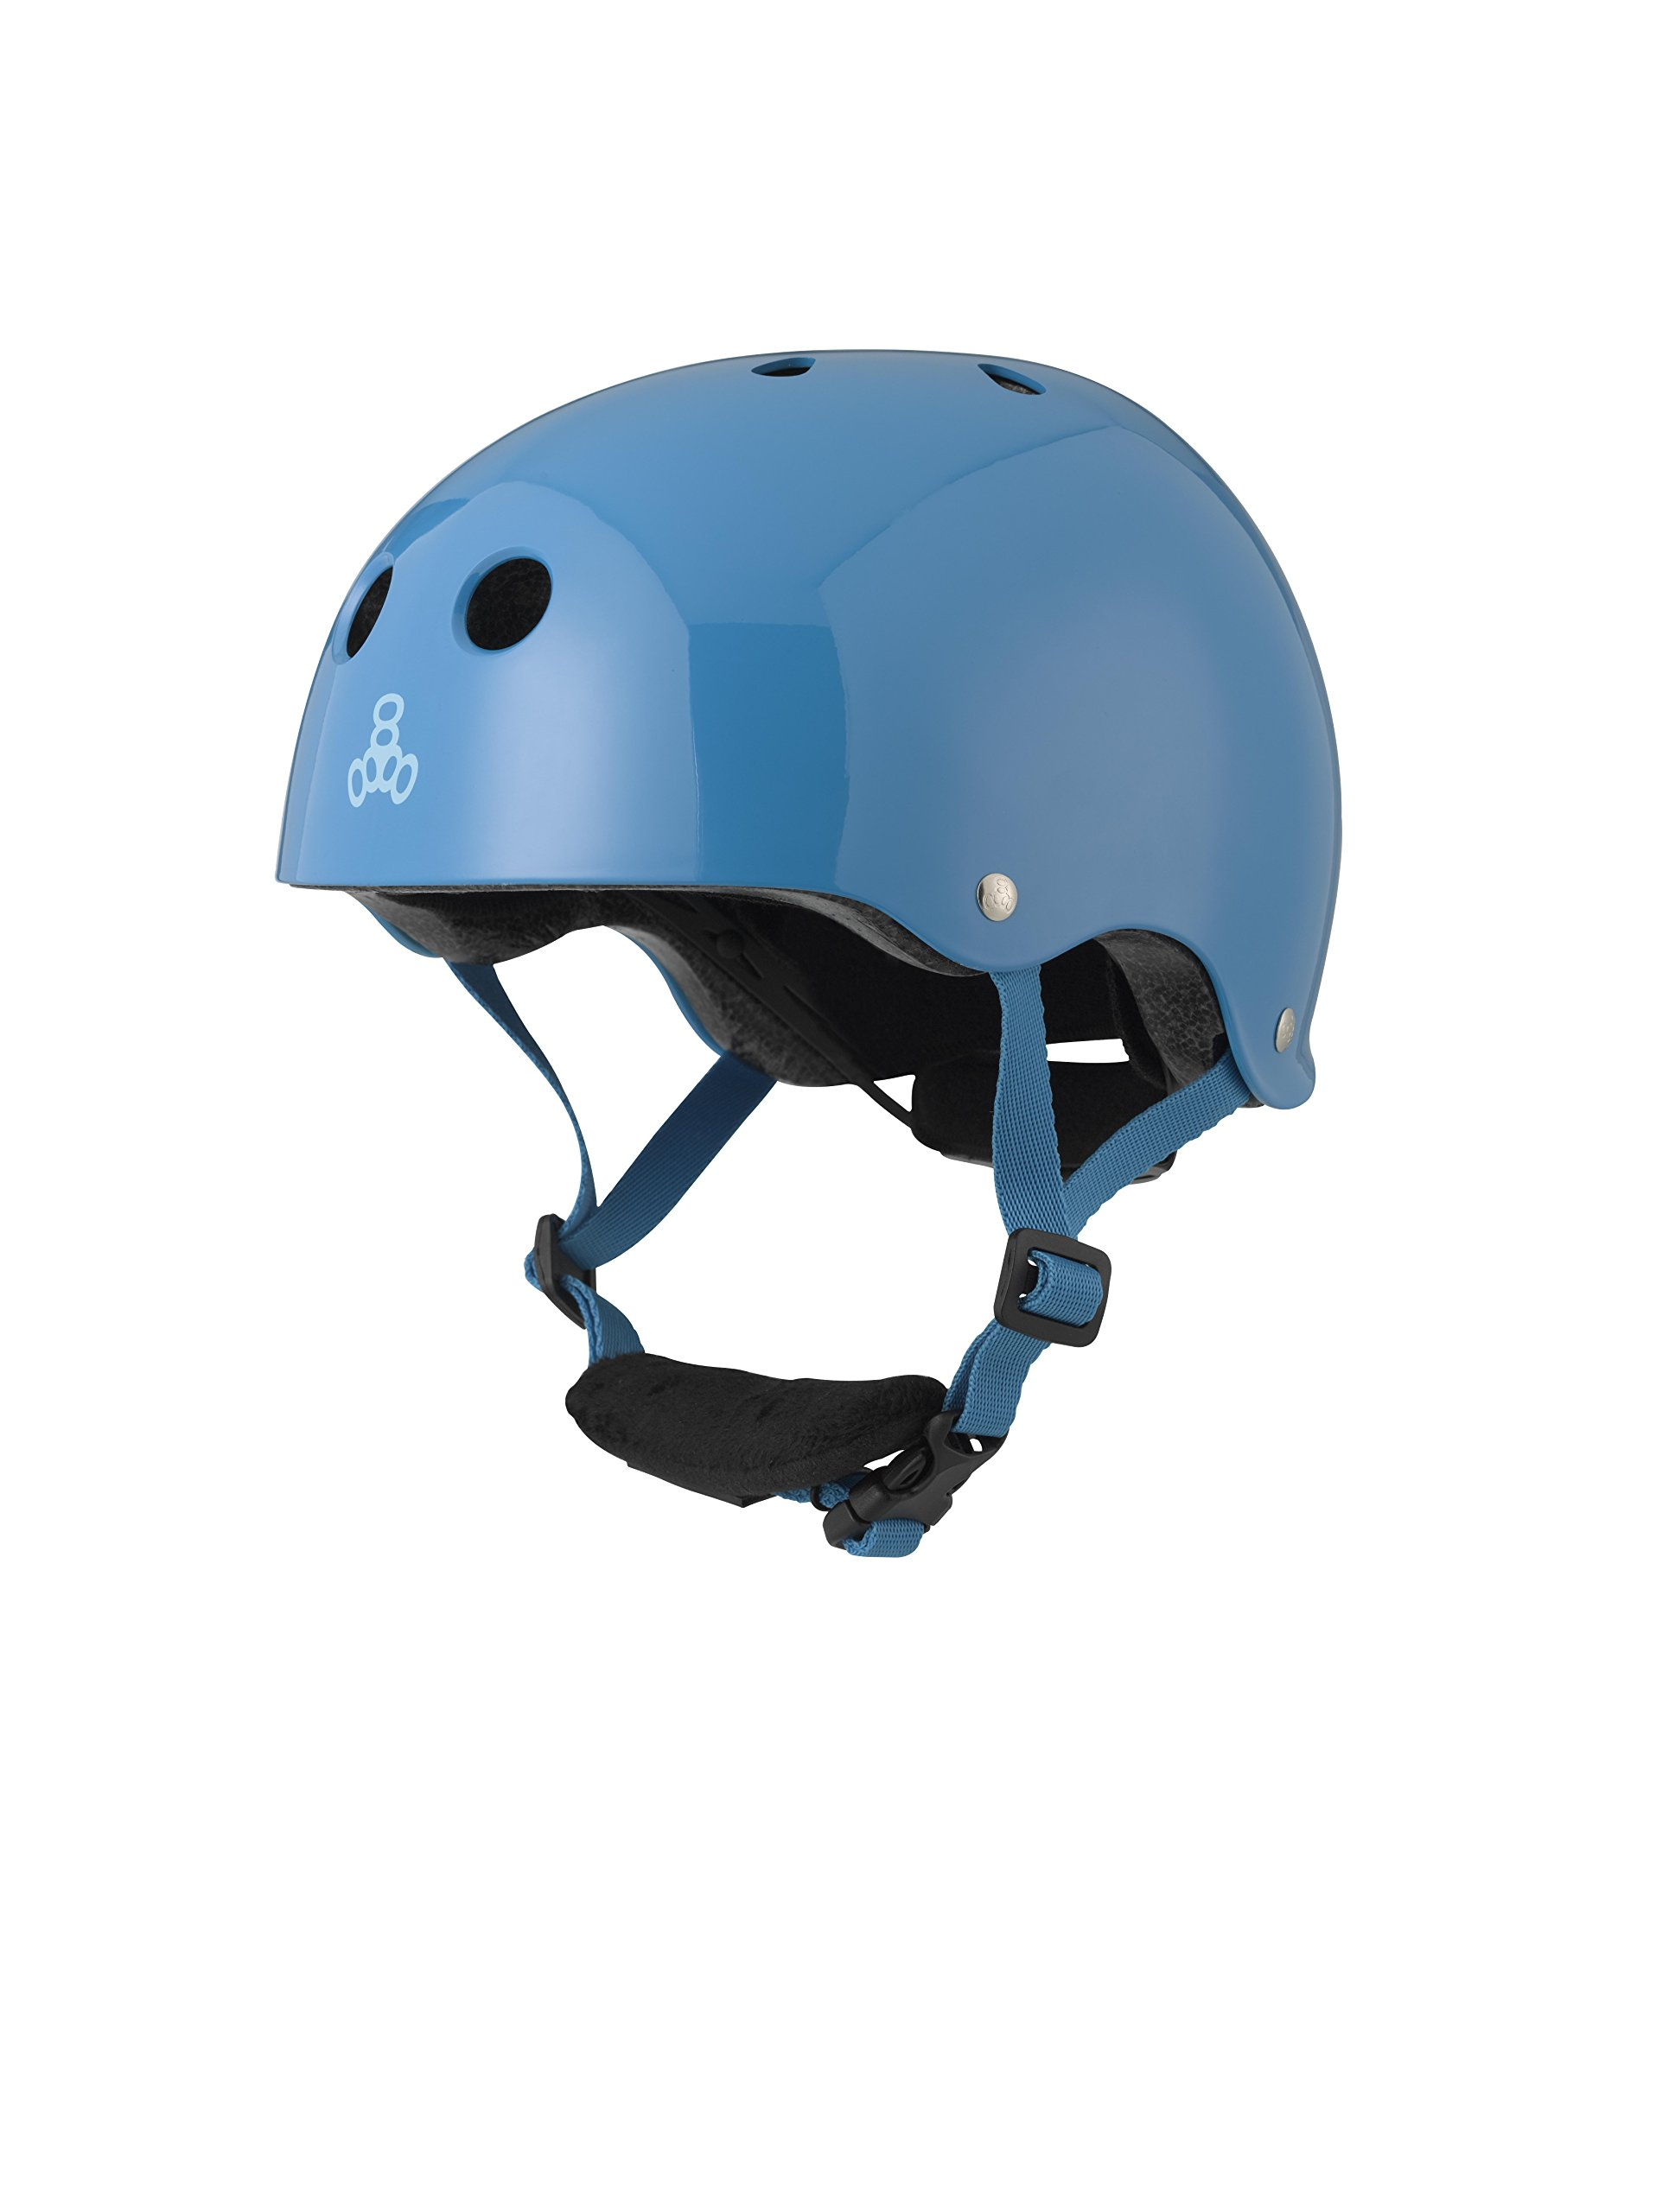 Triple Eight Lil 8 Dual Certified Sweatsaver Kids Skateboard and Bike Helmet with Padded Chin Buckle, Blue Glossy